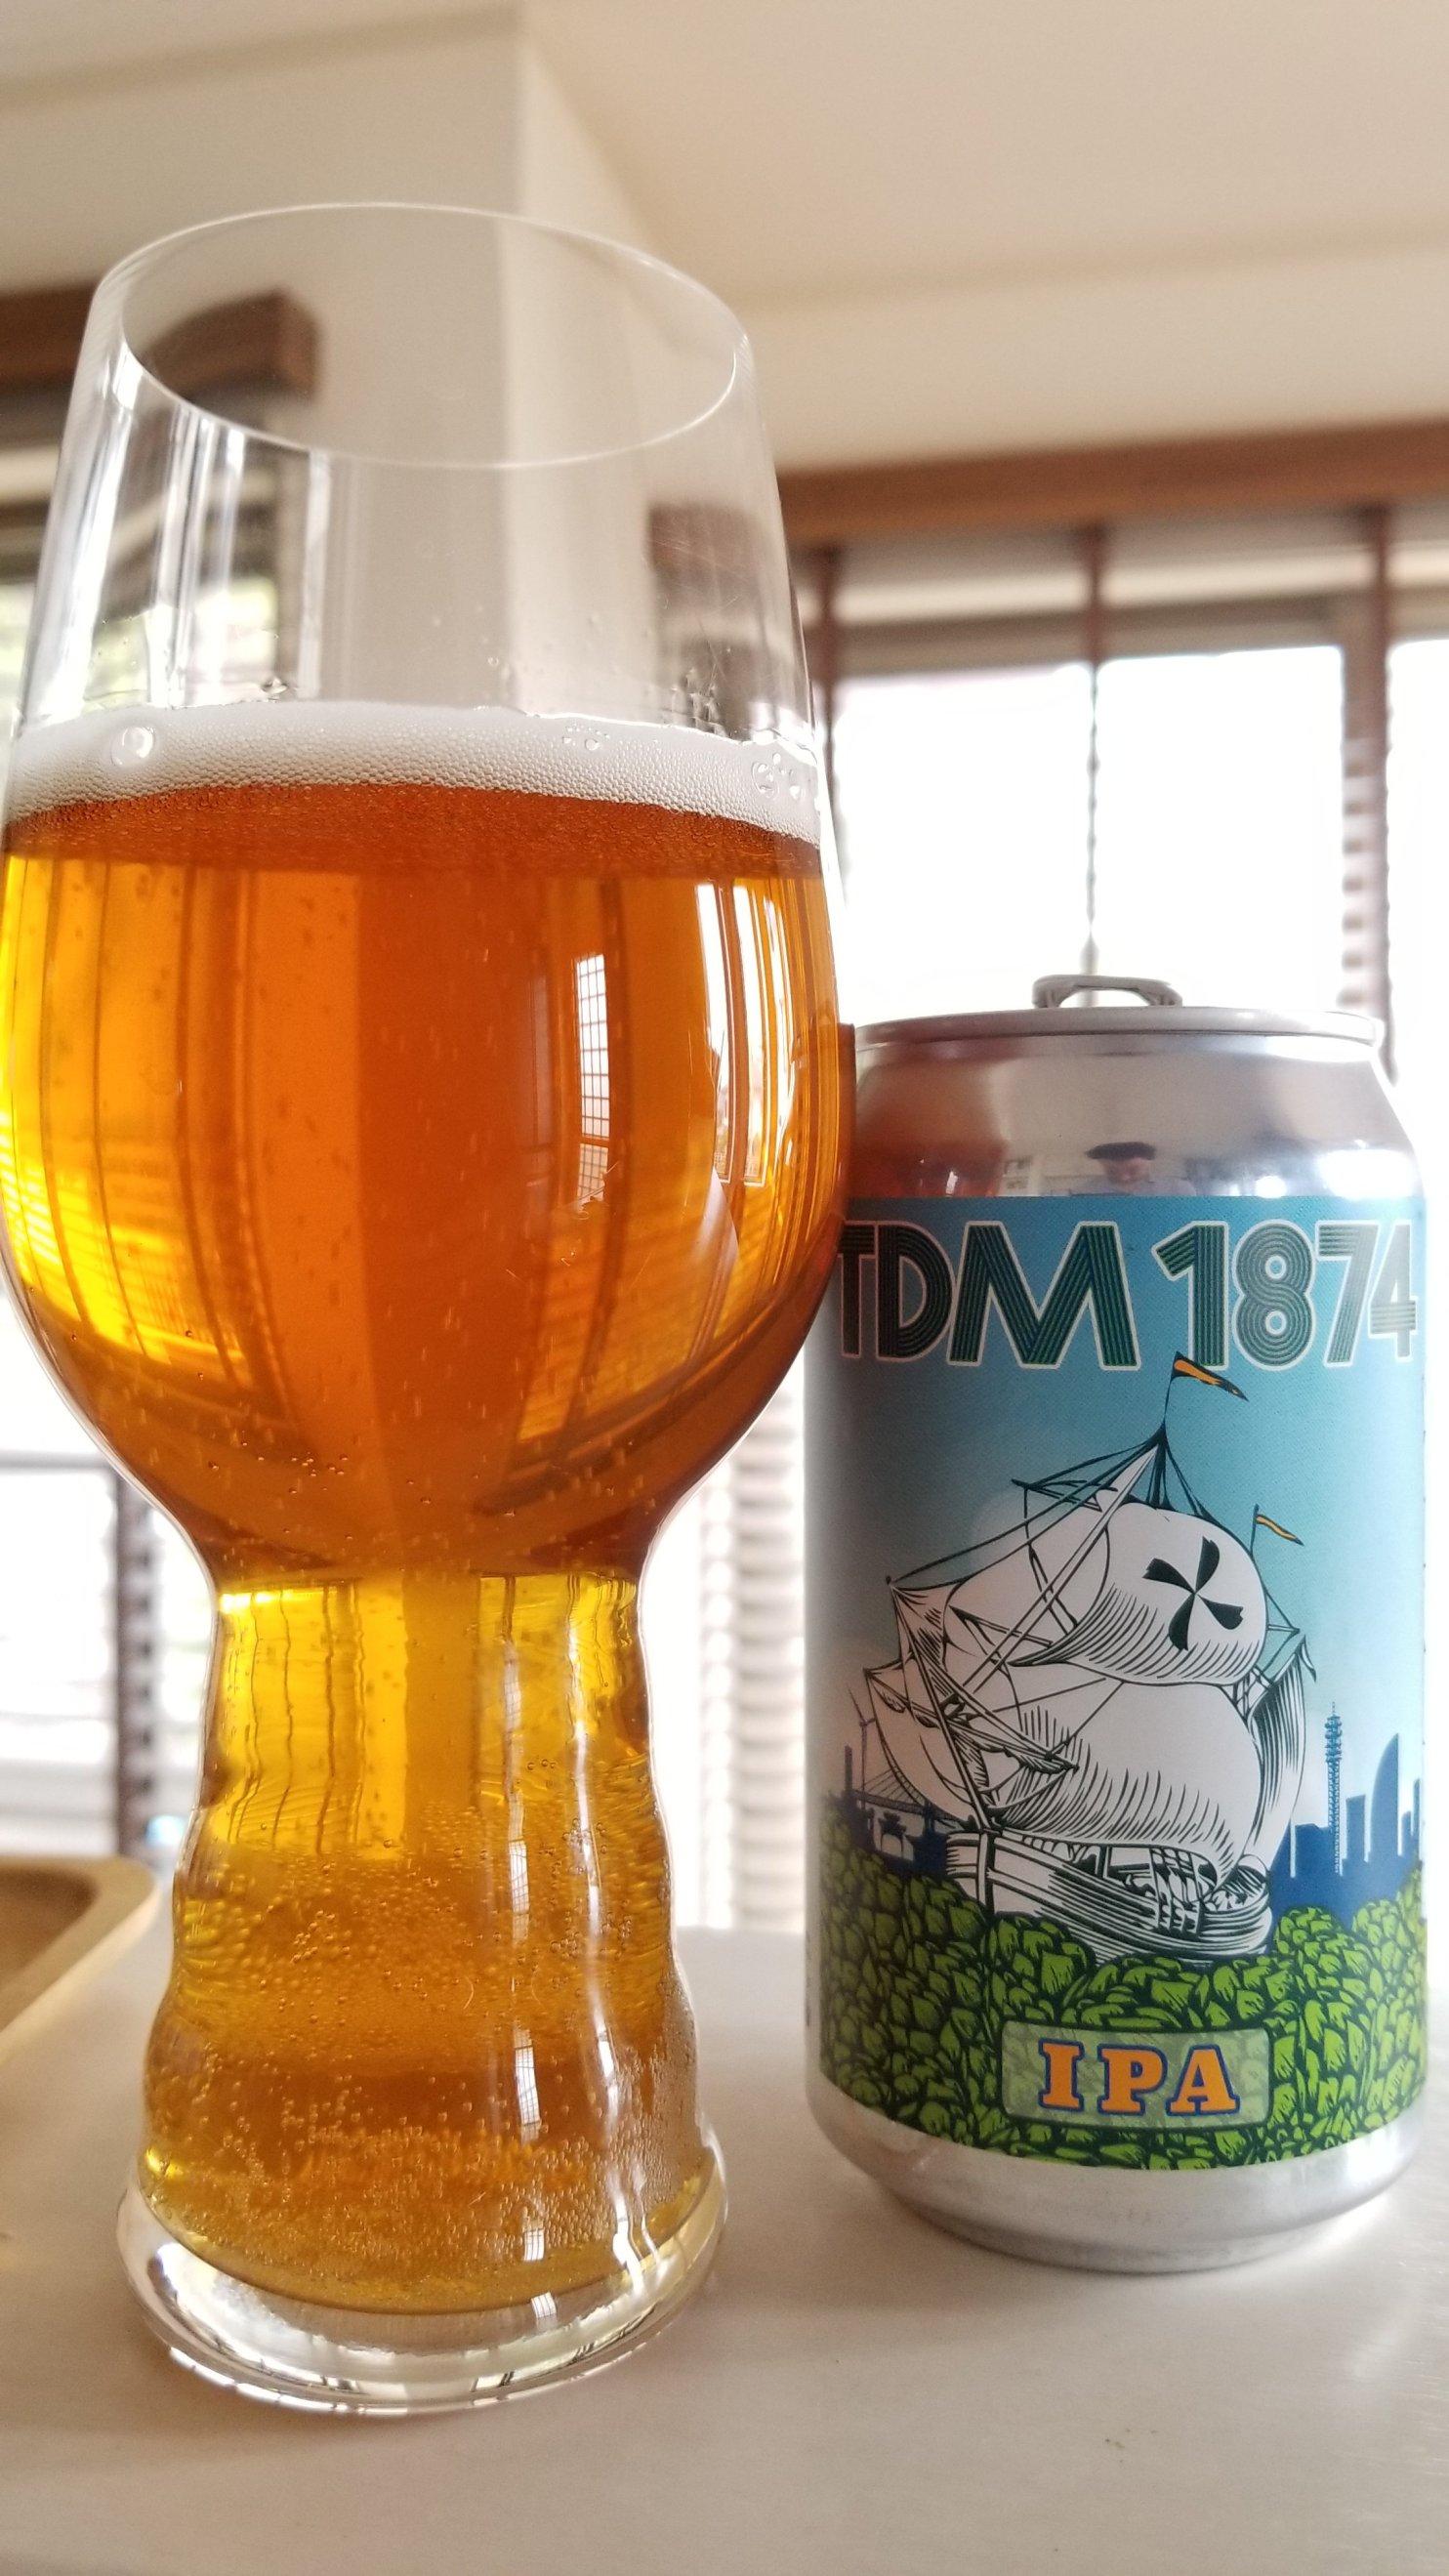 TDM 1874 IPA #8